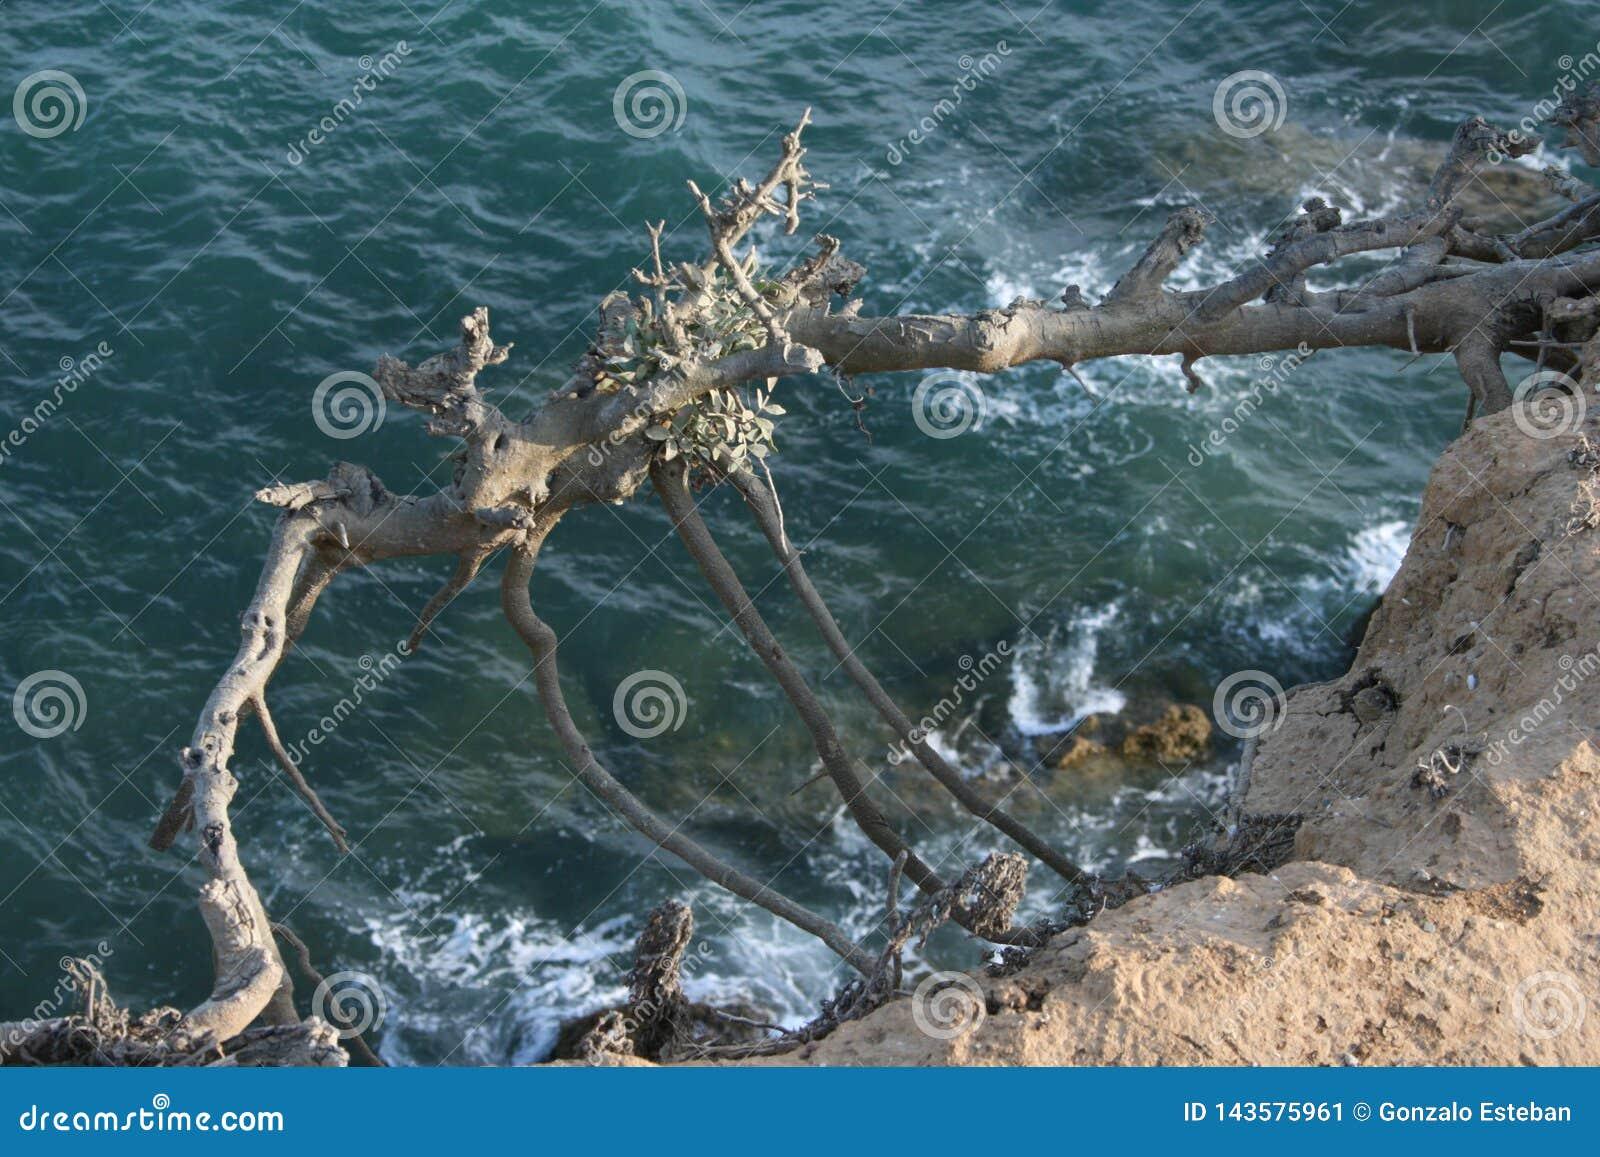 Flying tree over the ocean